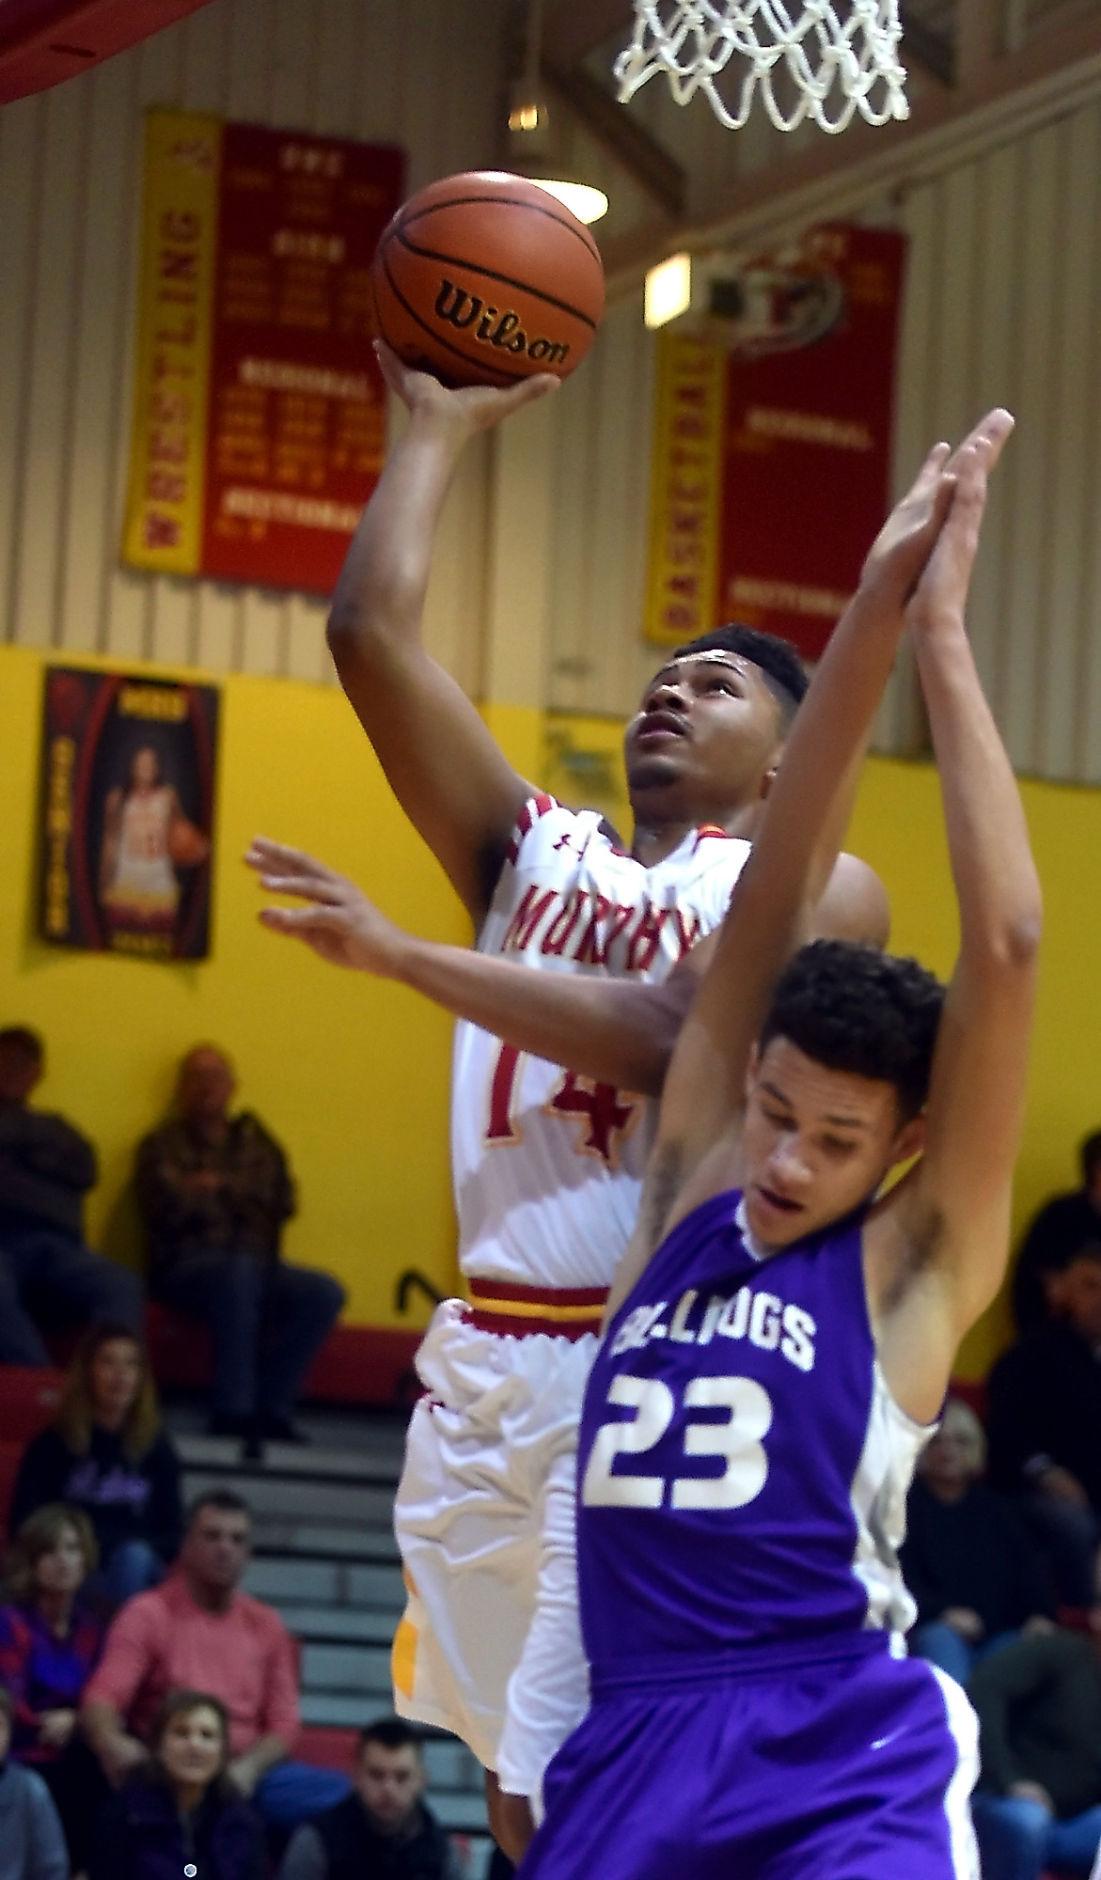 Murphysboro Defeats Harrisburg in Boys Basketball